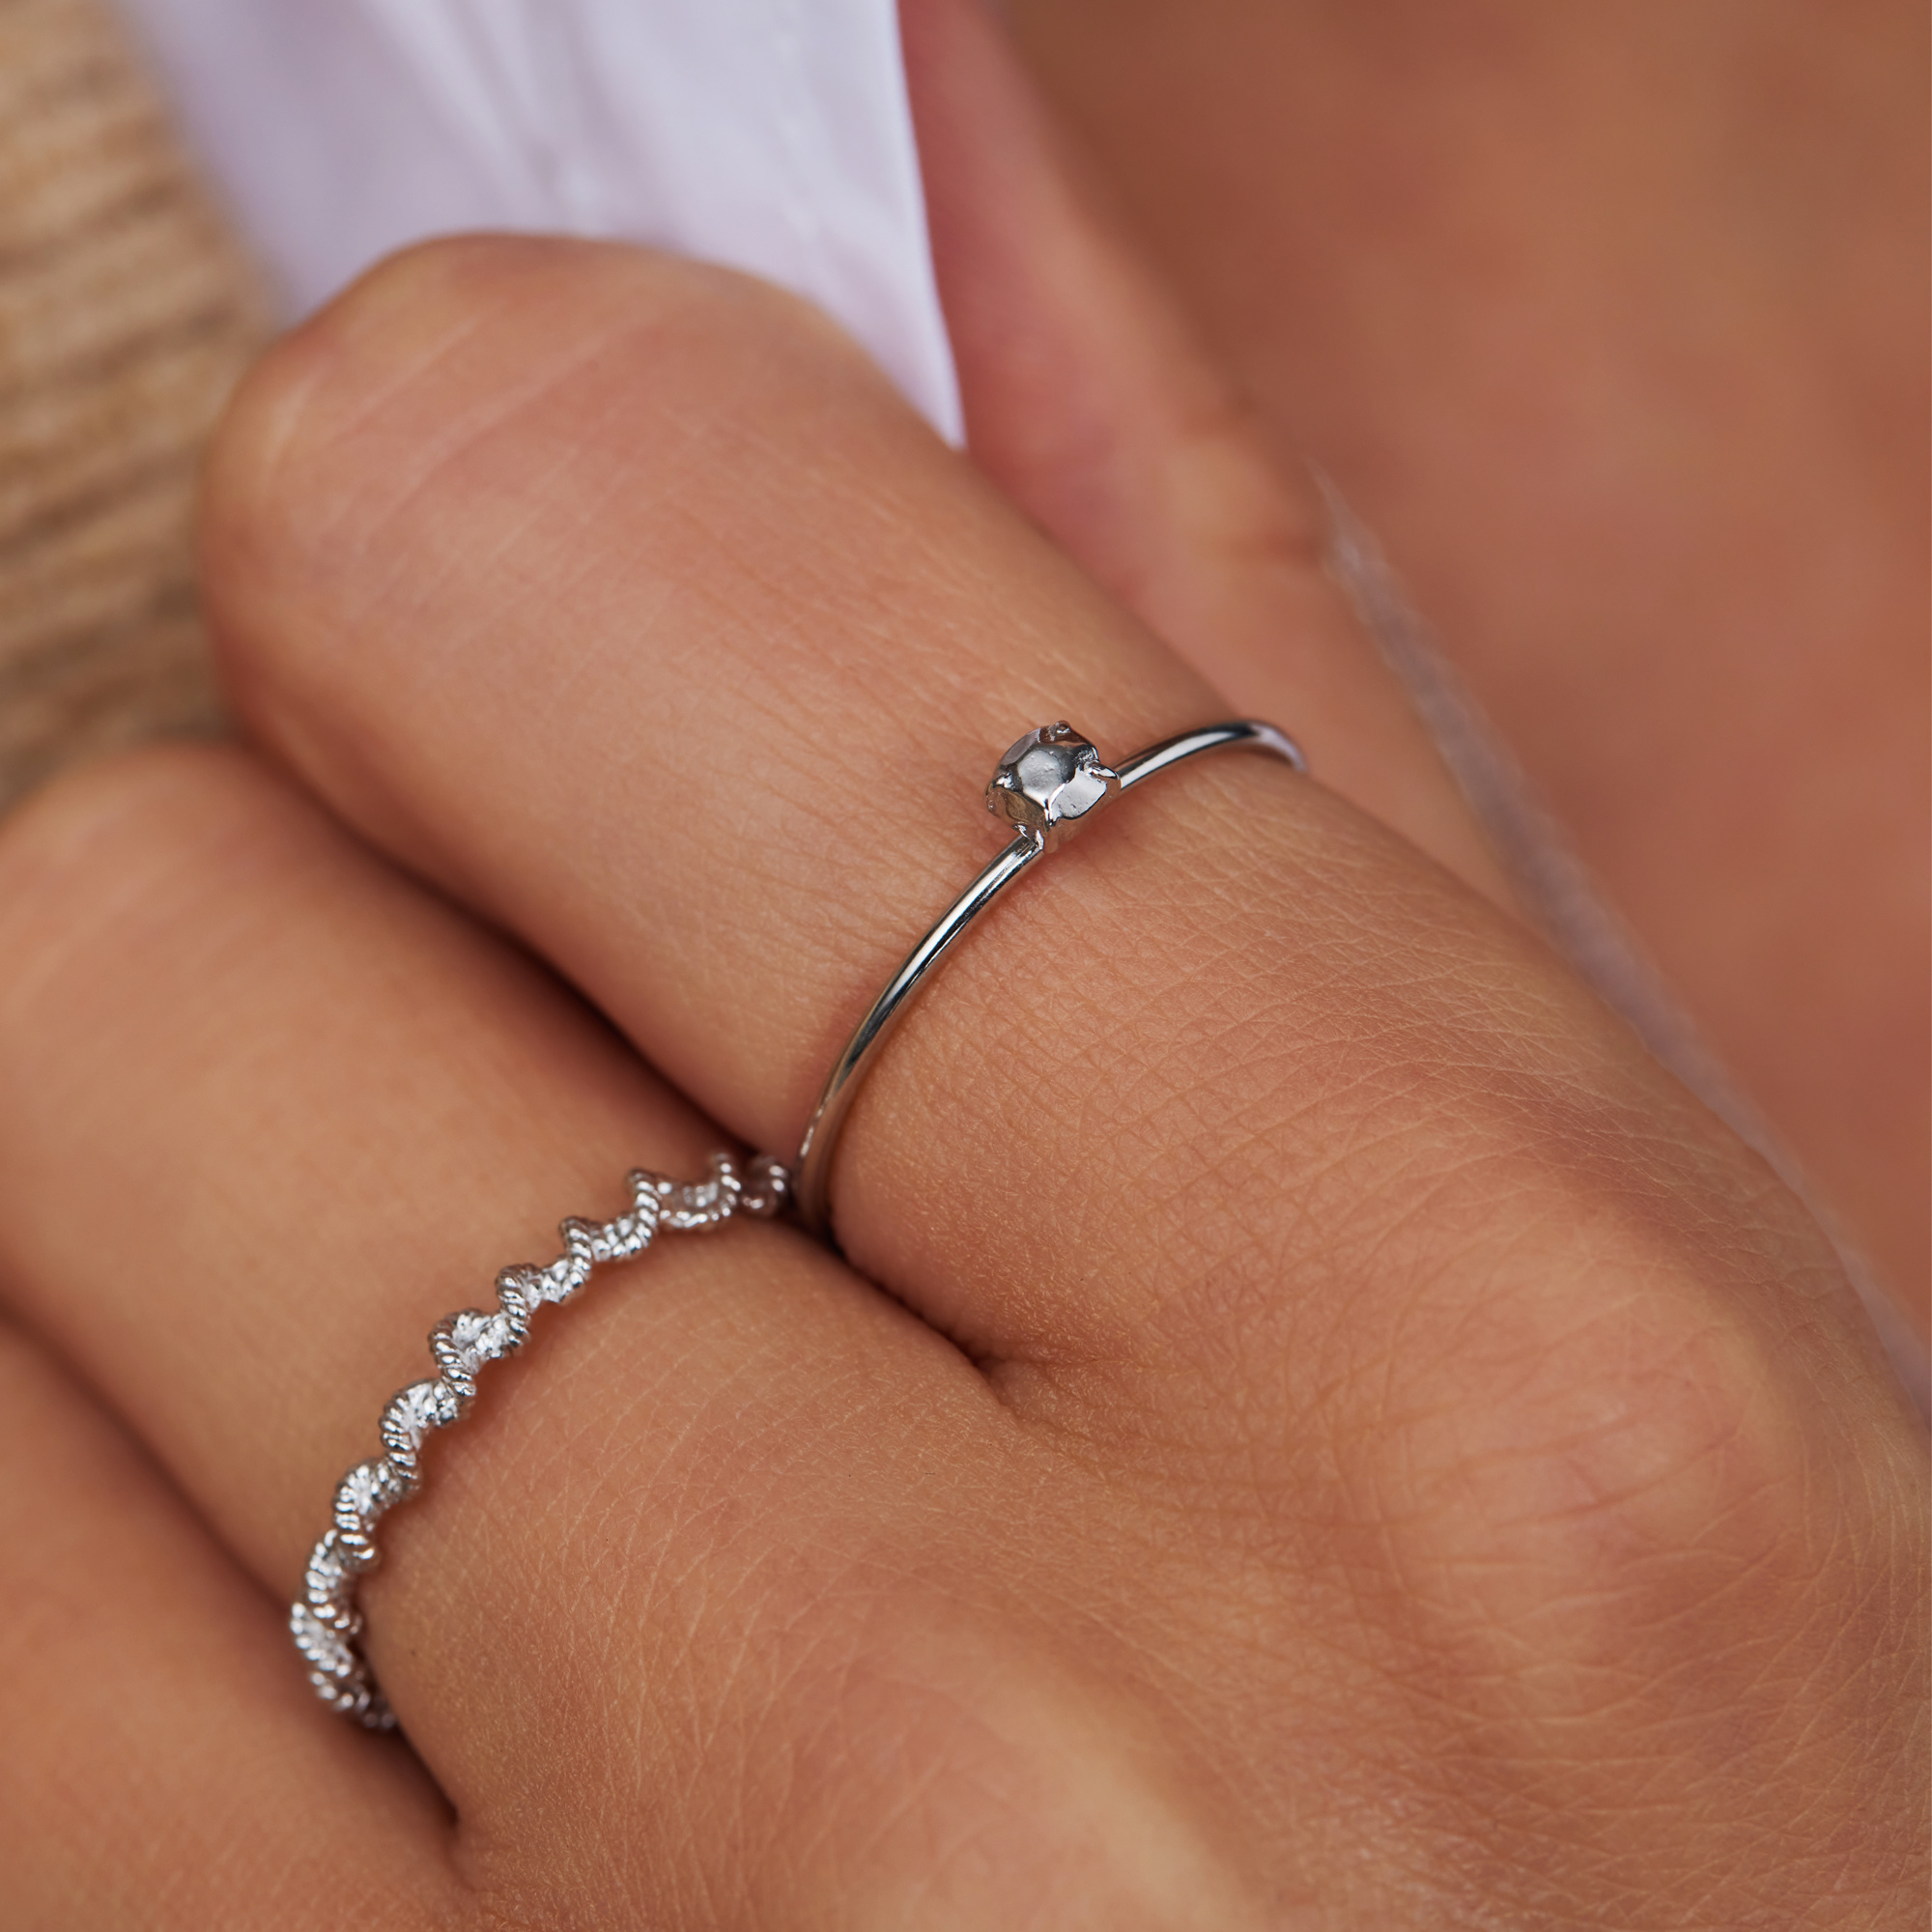 Violet Hamden Sisterhood Stone 925 sterling silver ring with stone